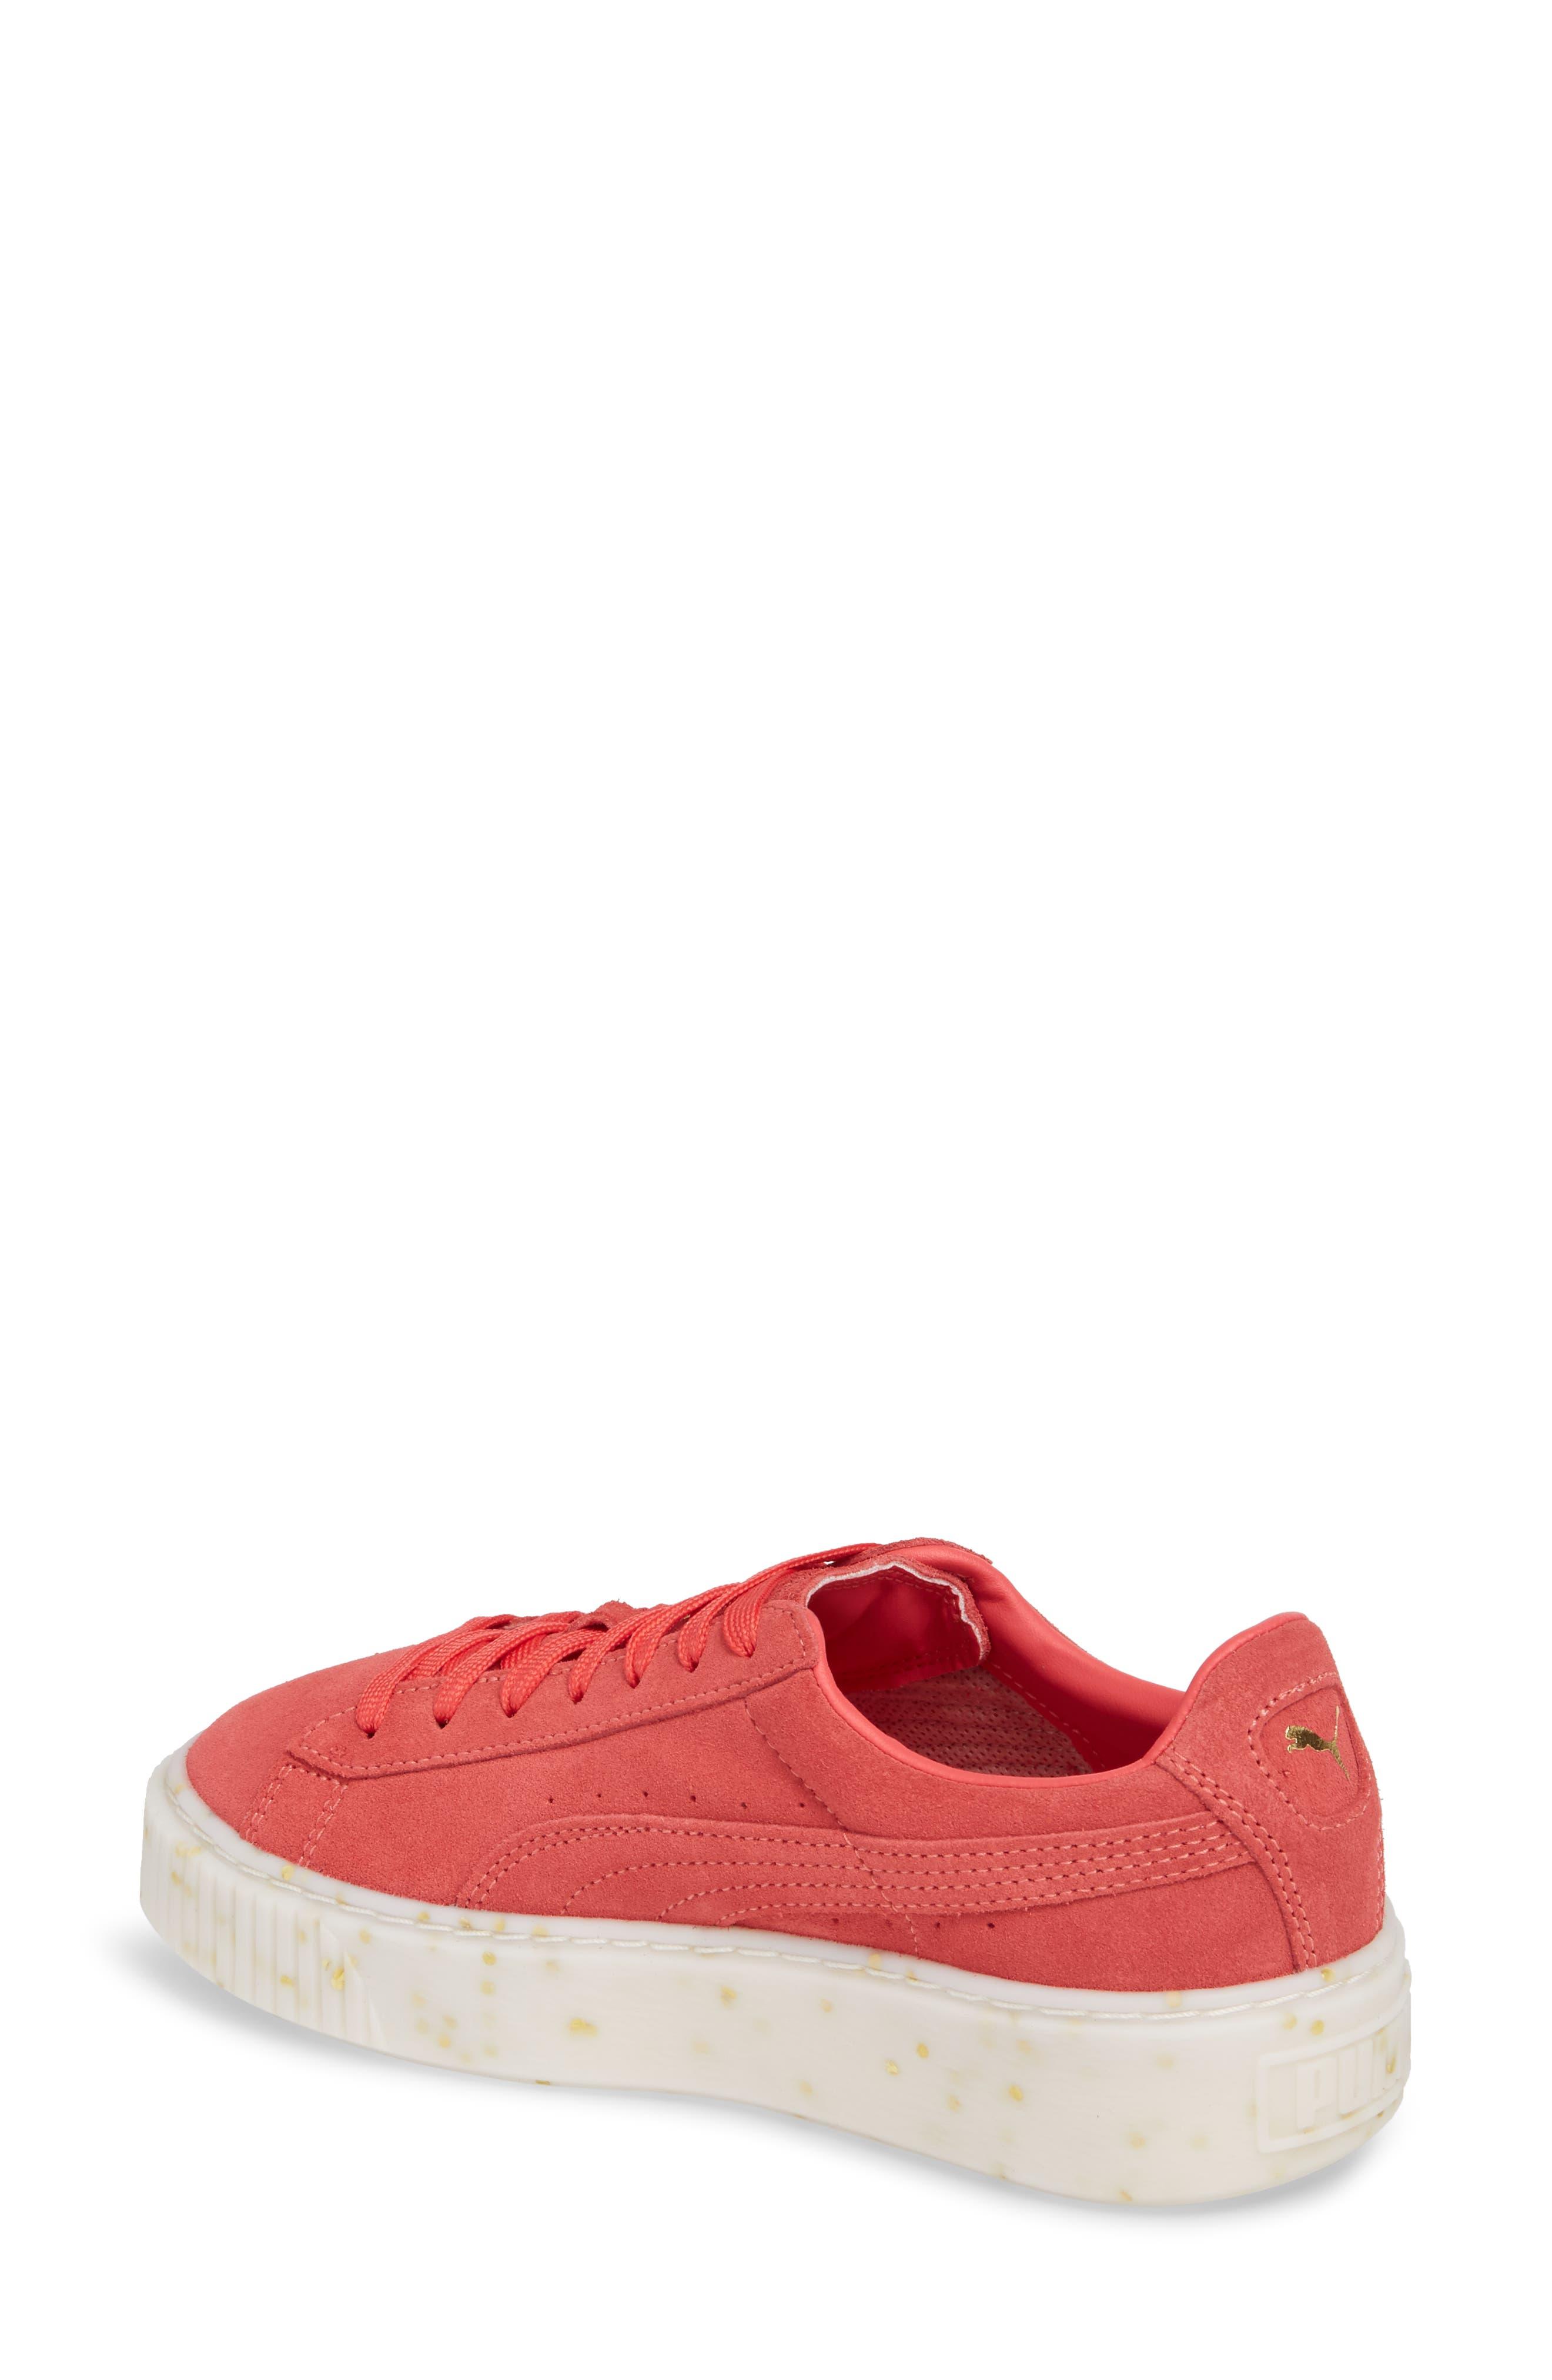 PUMA, Suede Platform Sneaker, Alternate thumbnail 2, color, PARADISE PINK/ TEAM GOLD